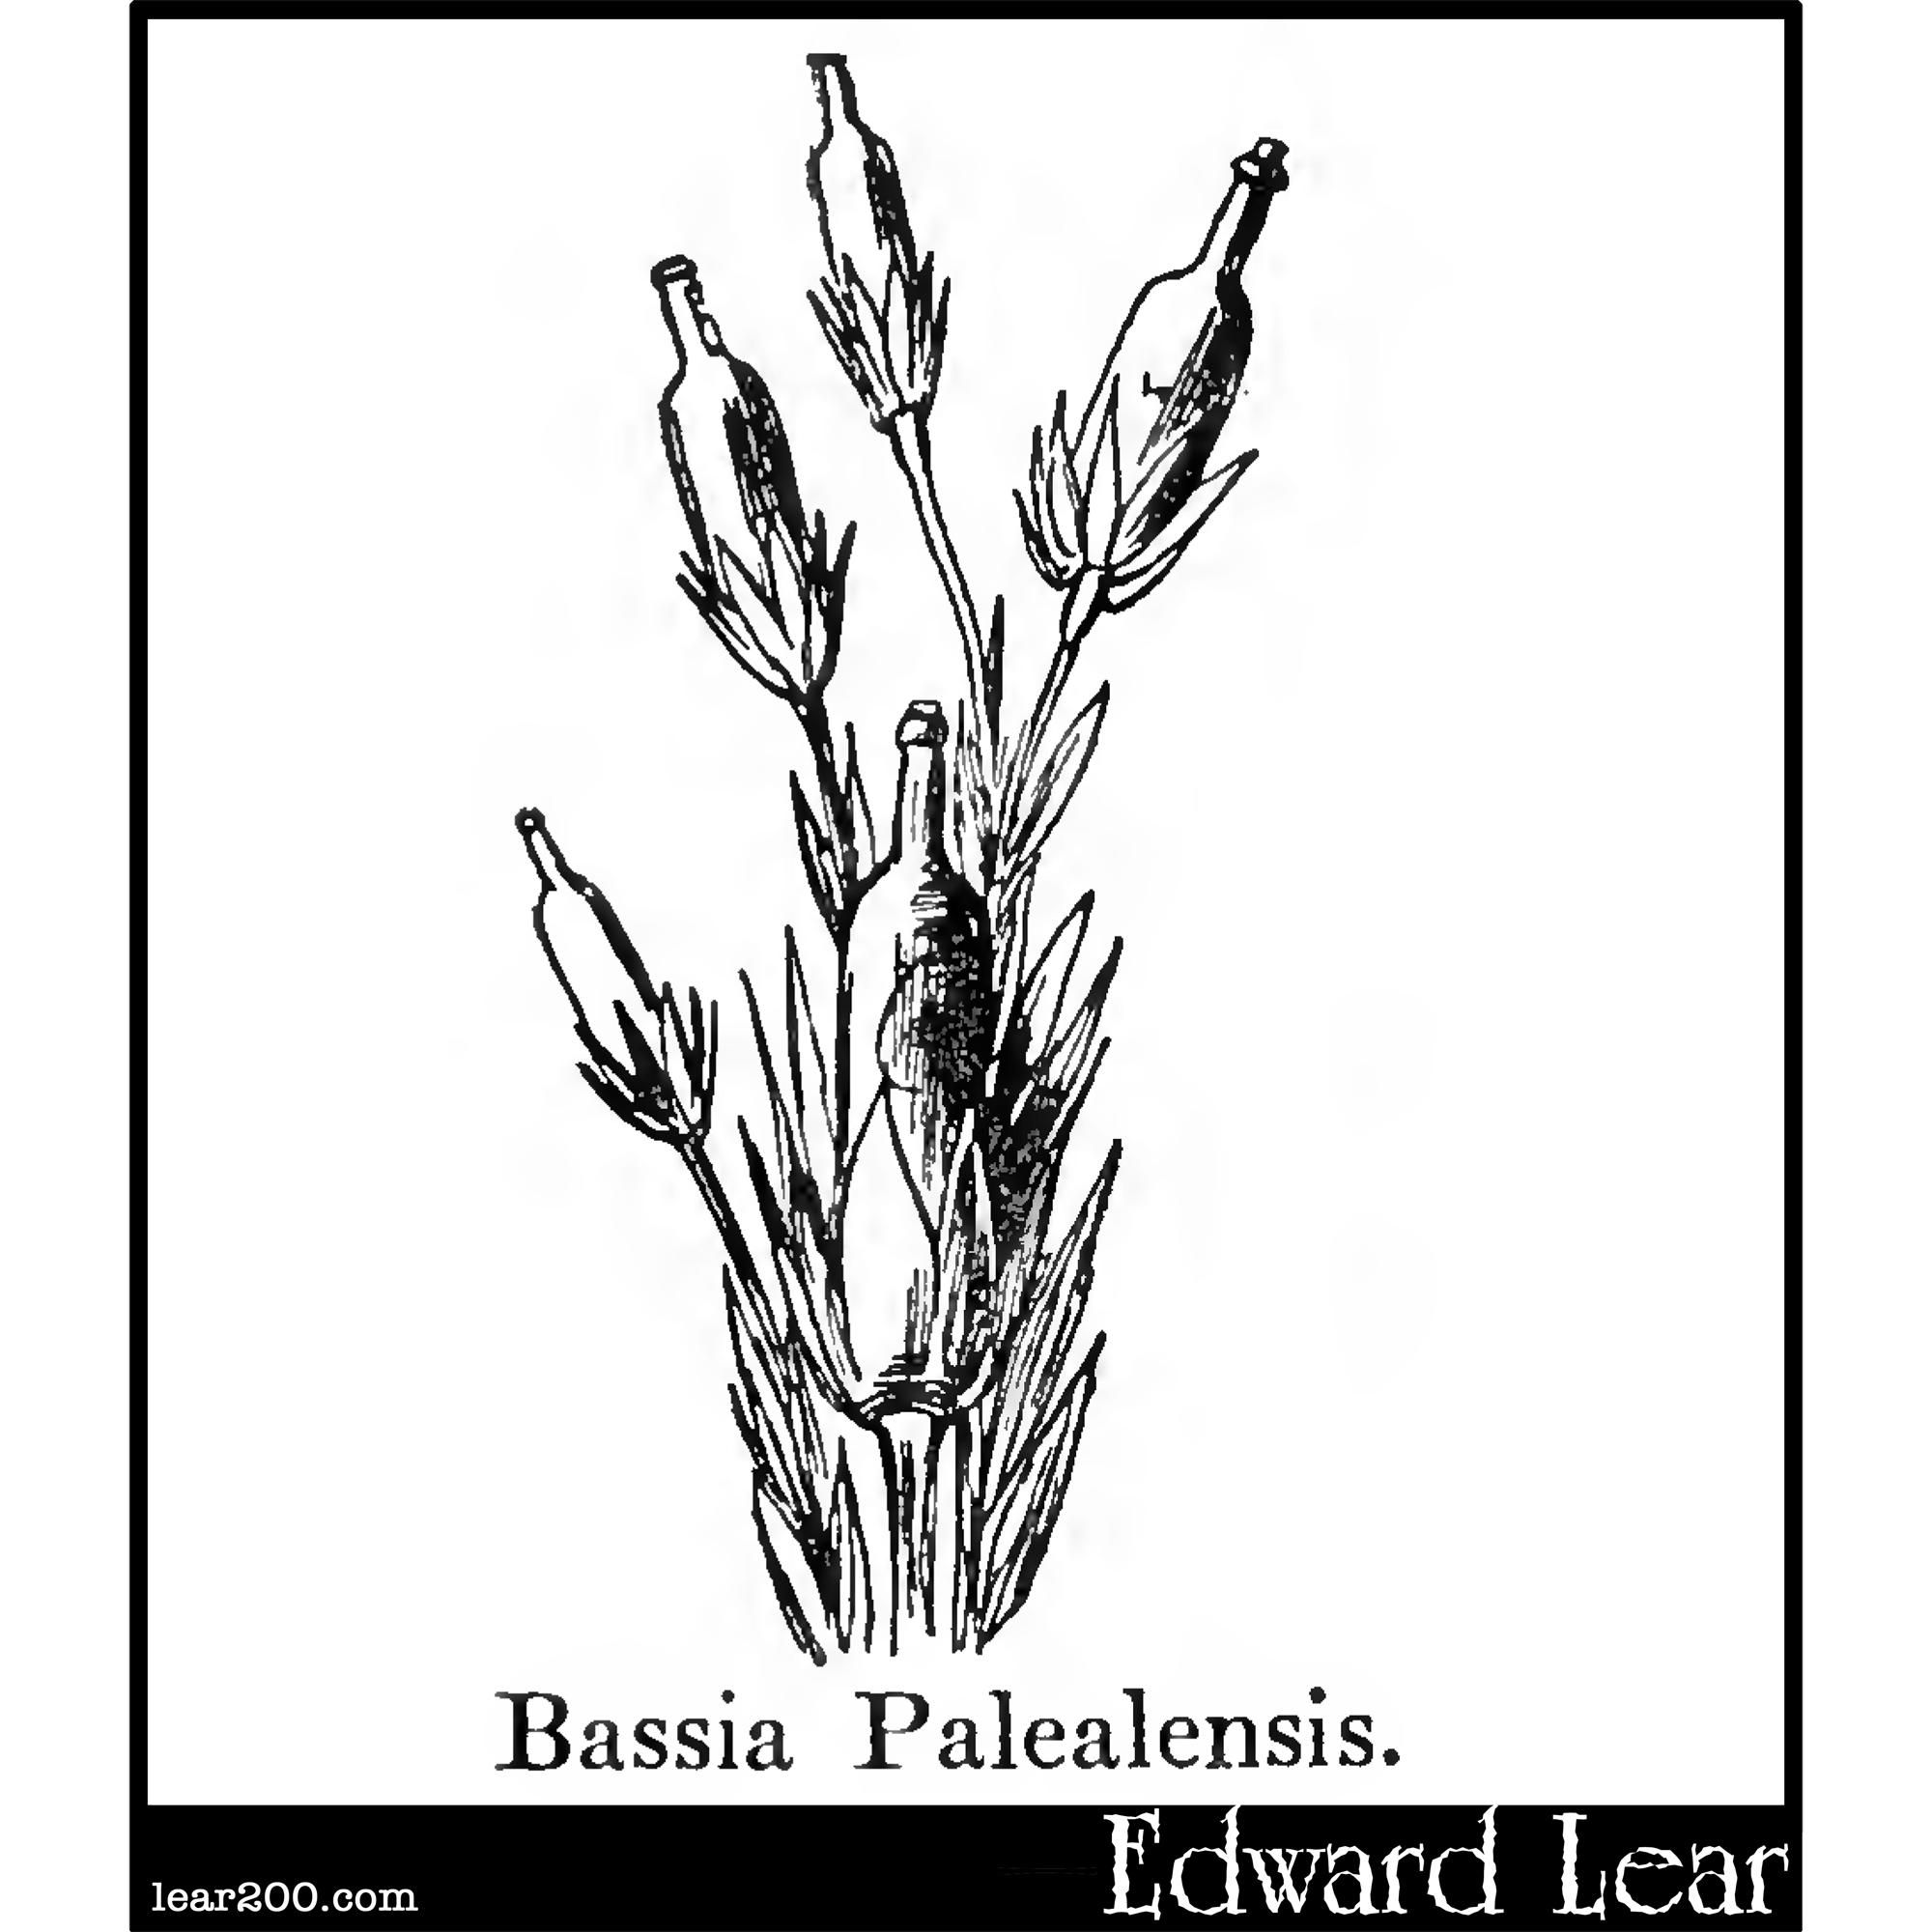 Bassia Palealensis.